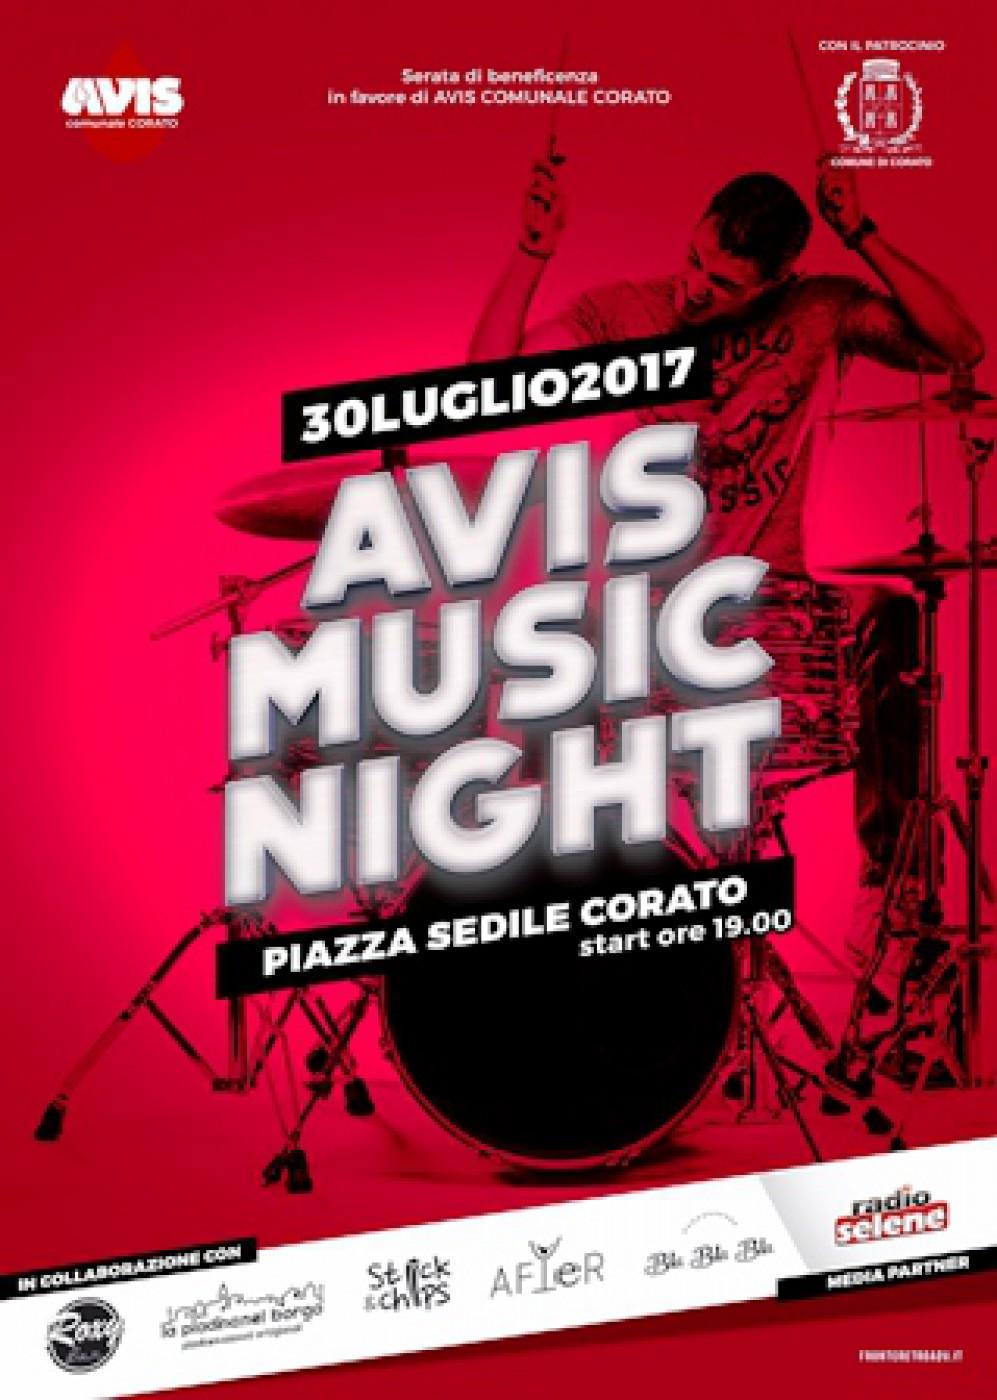 CORATO: AVIS MUSIC NIGHT